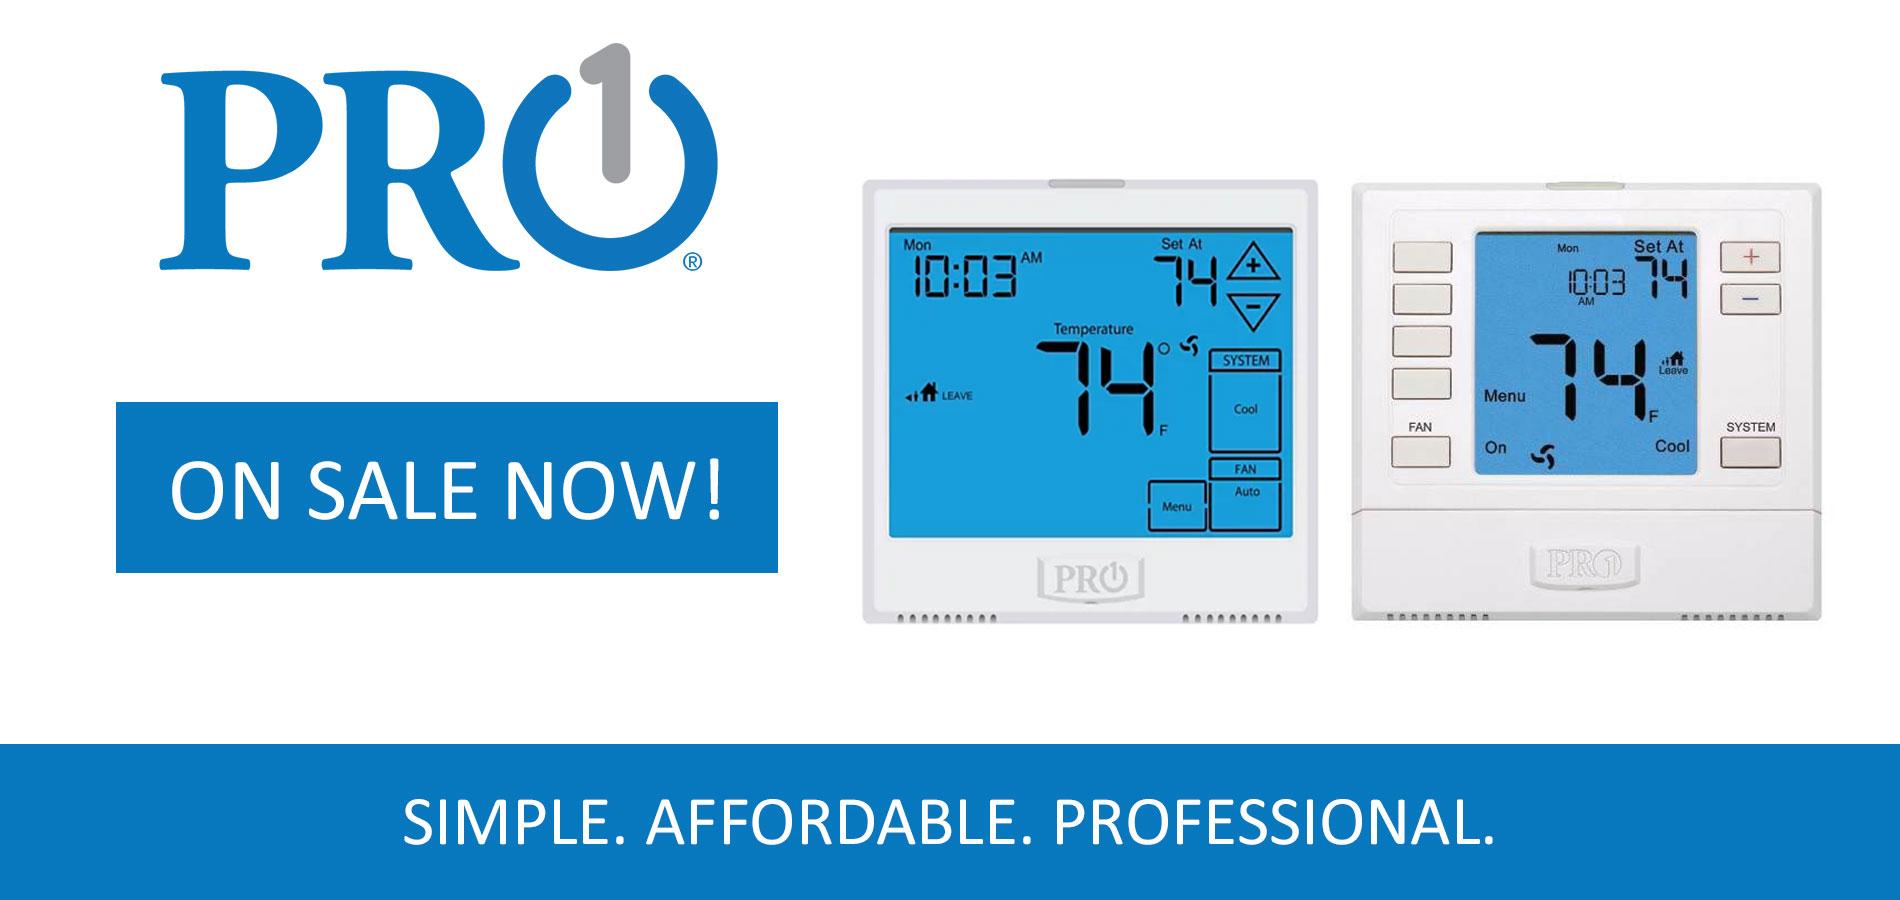 Pro1 Thermostats